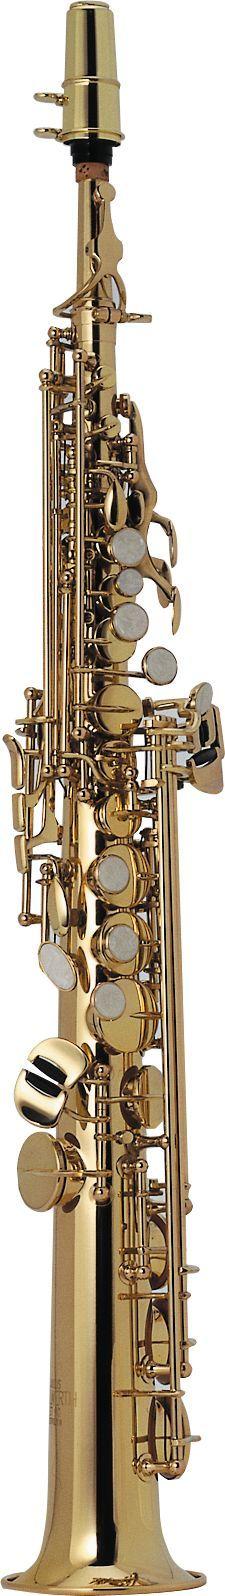 J. Keilwerth Student - B-Sopransaxophon JK1100-8-0, incl. Etui u. Zubehör